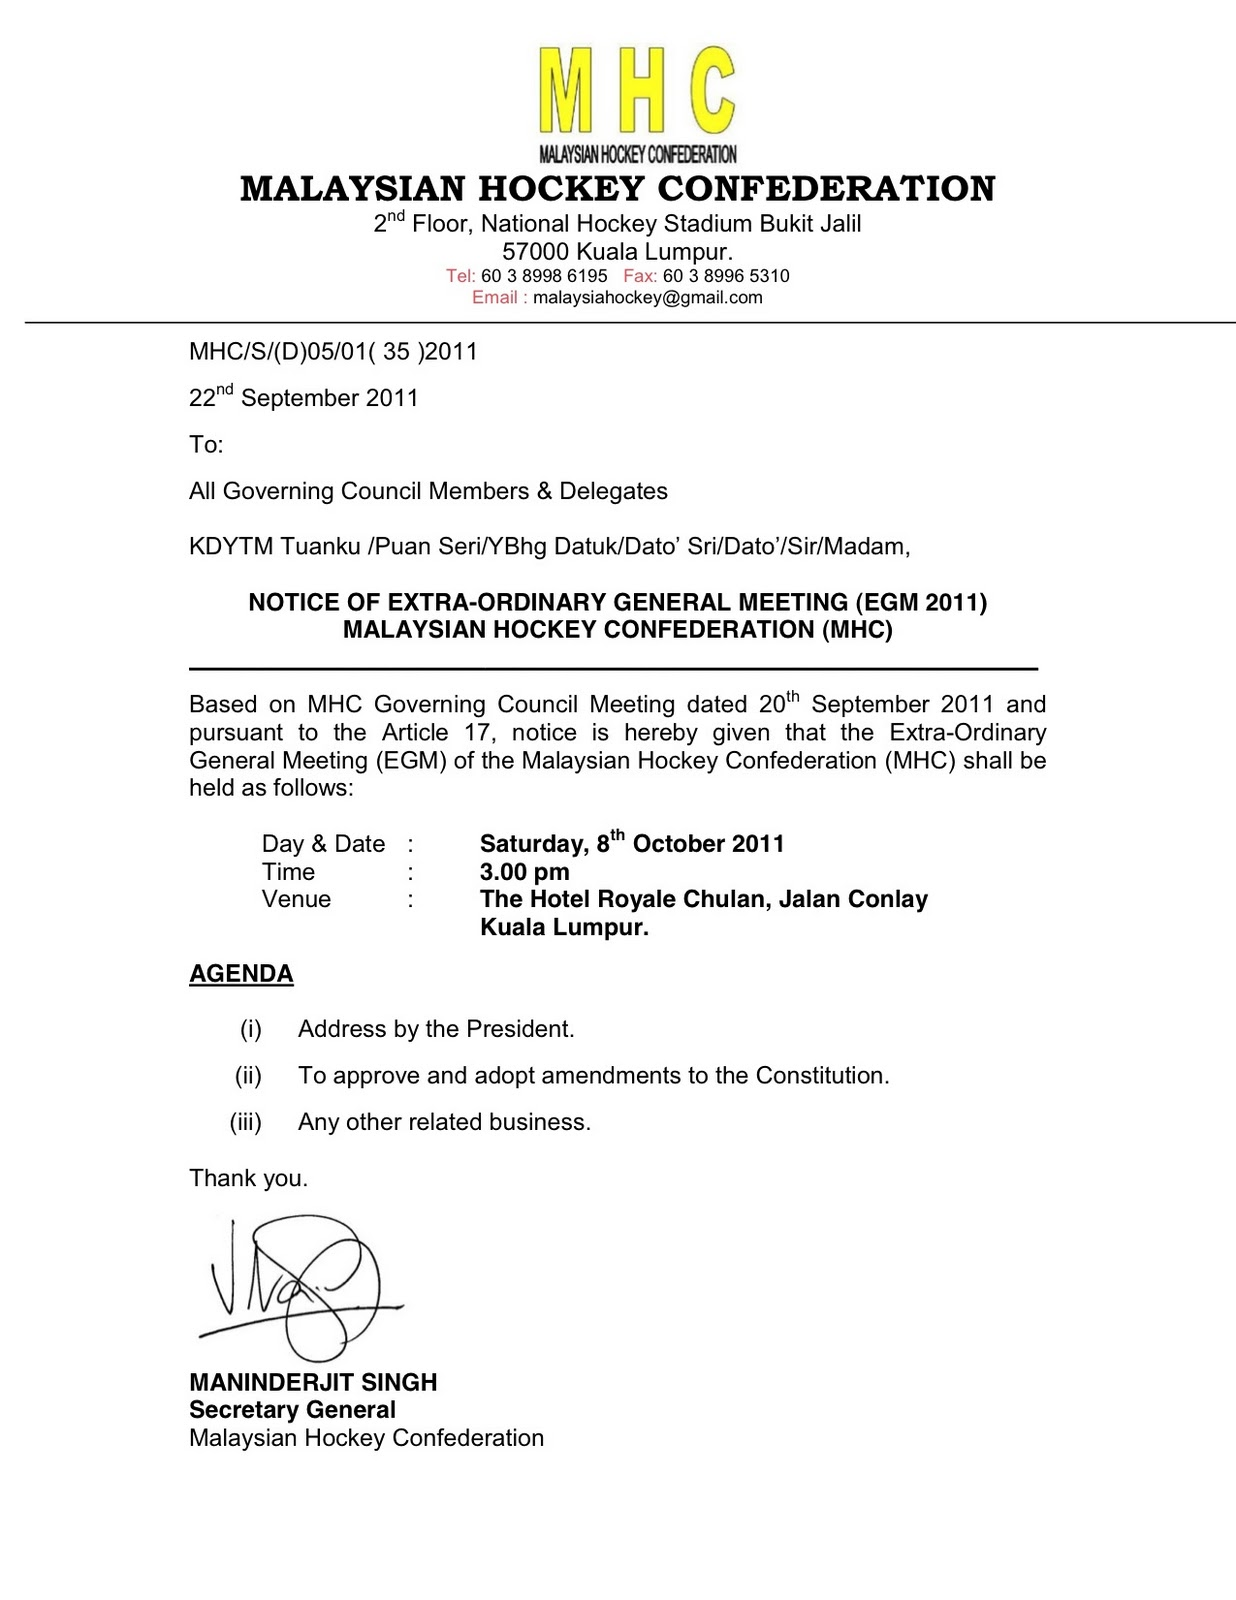 Extraordinary general meeting of im24ca on november 6th | melges24.